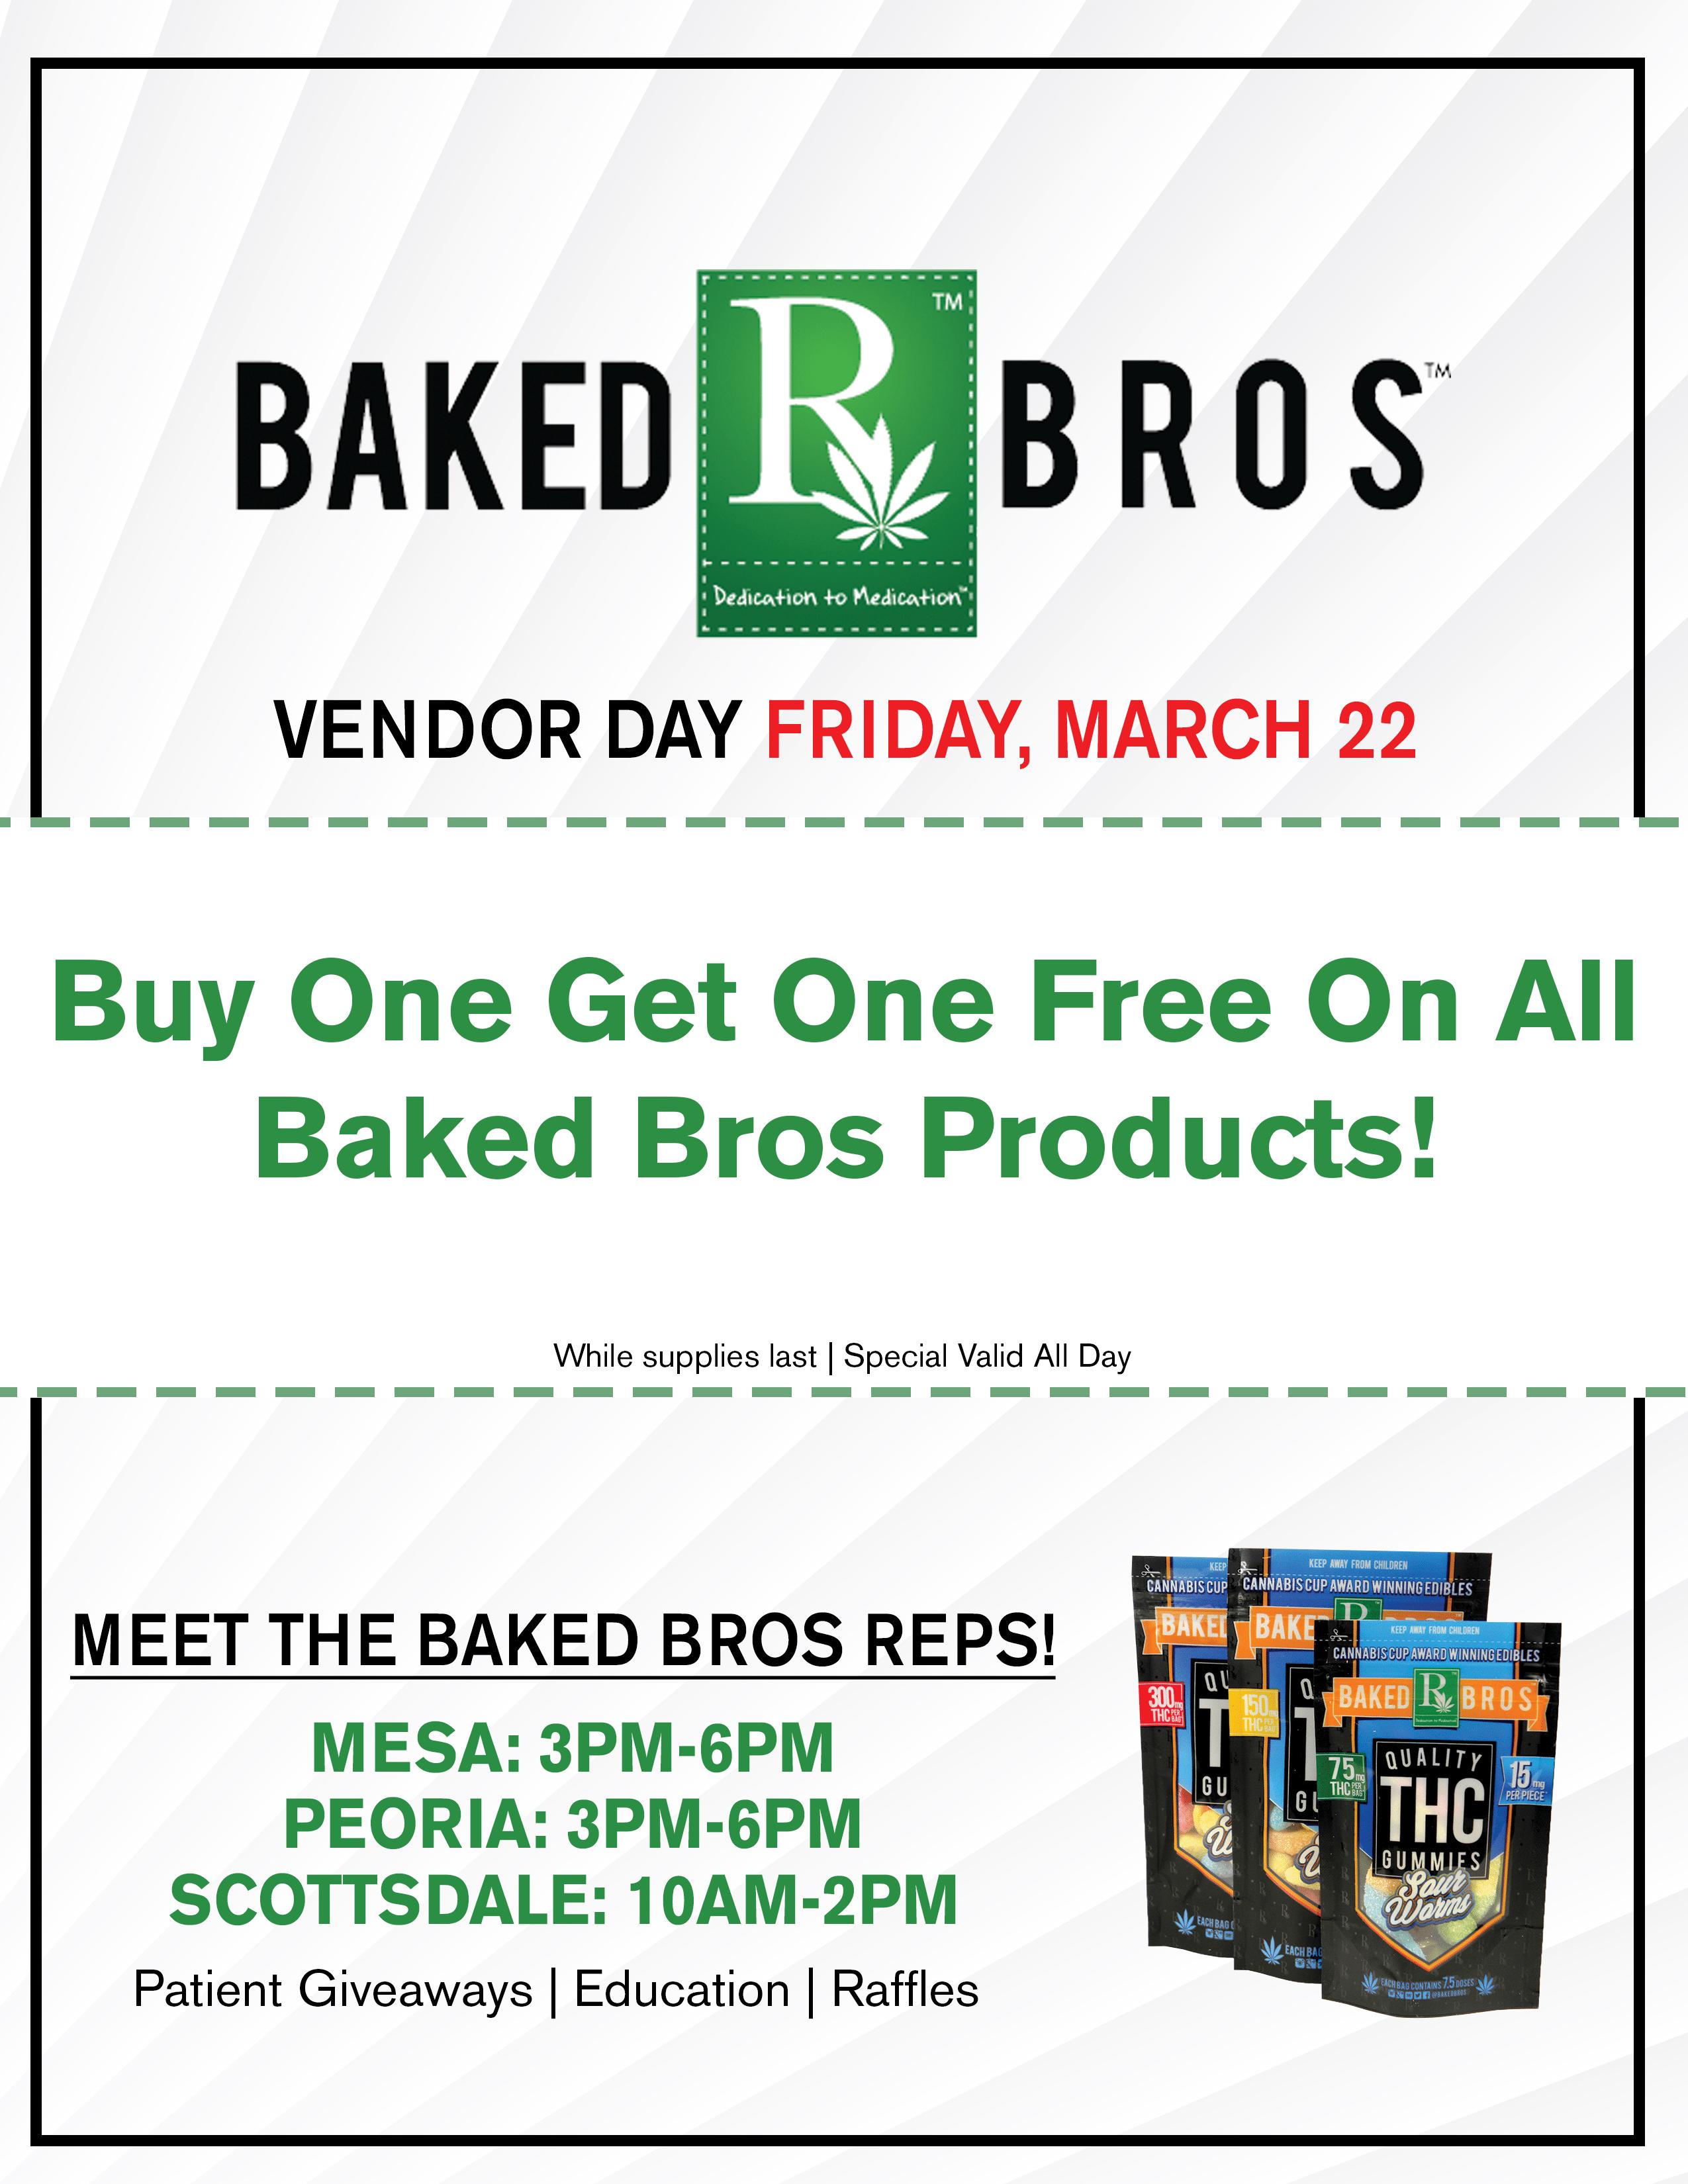 Baked Bros Vendor Day